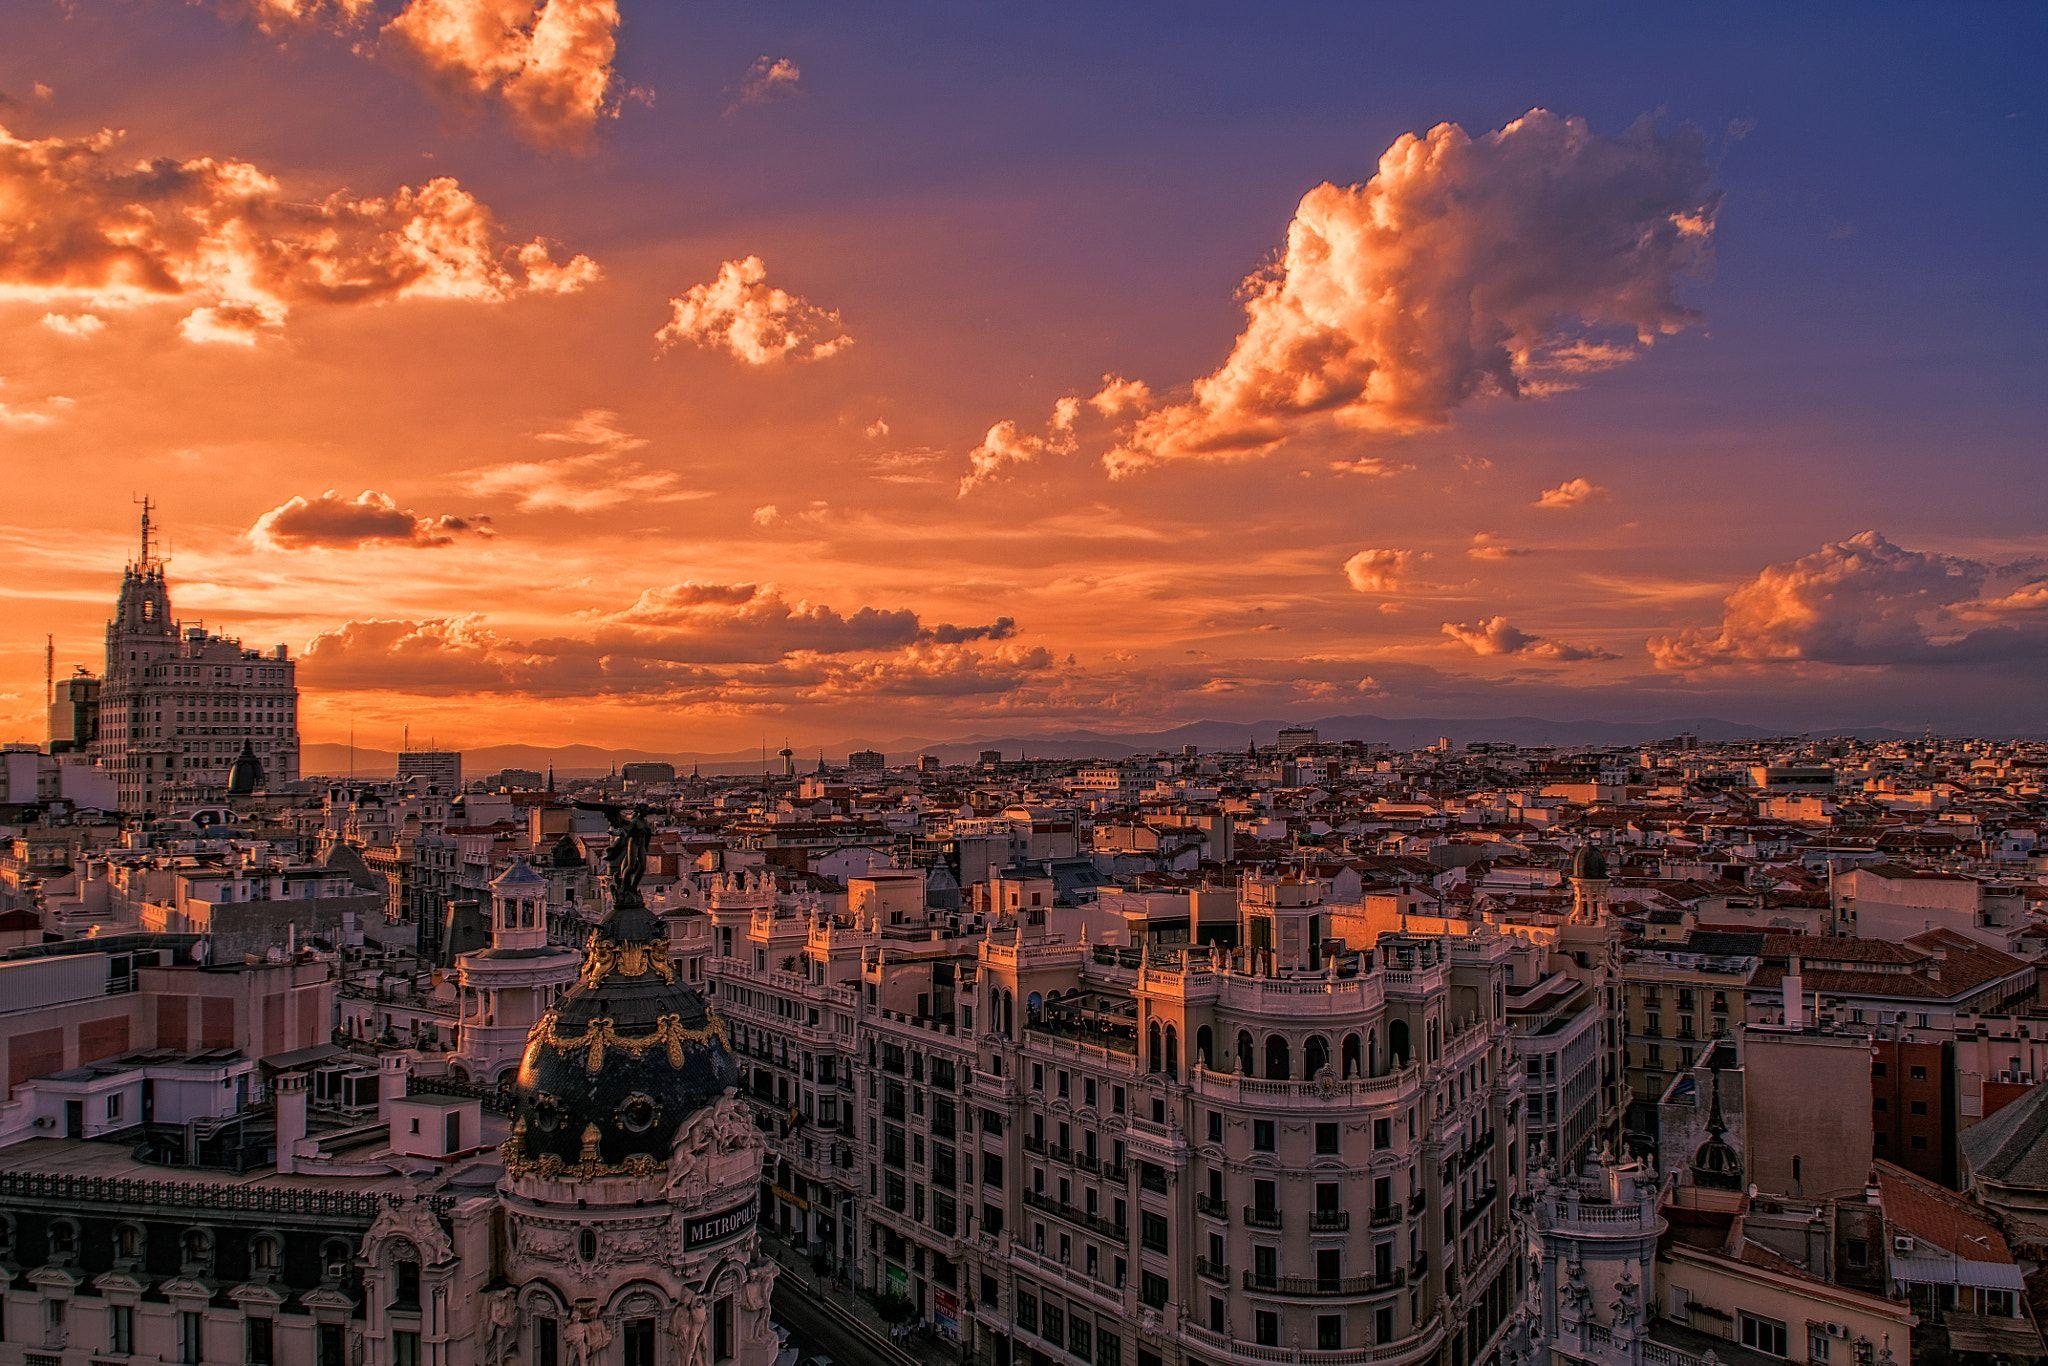 Madrid 20 Tejados De Madrid Al Atardecer Desde La Terraza Del Circulo De Bellas Artes Over Madrid At Sunset From The Ter Madrid Skyline Madrid City Skyline